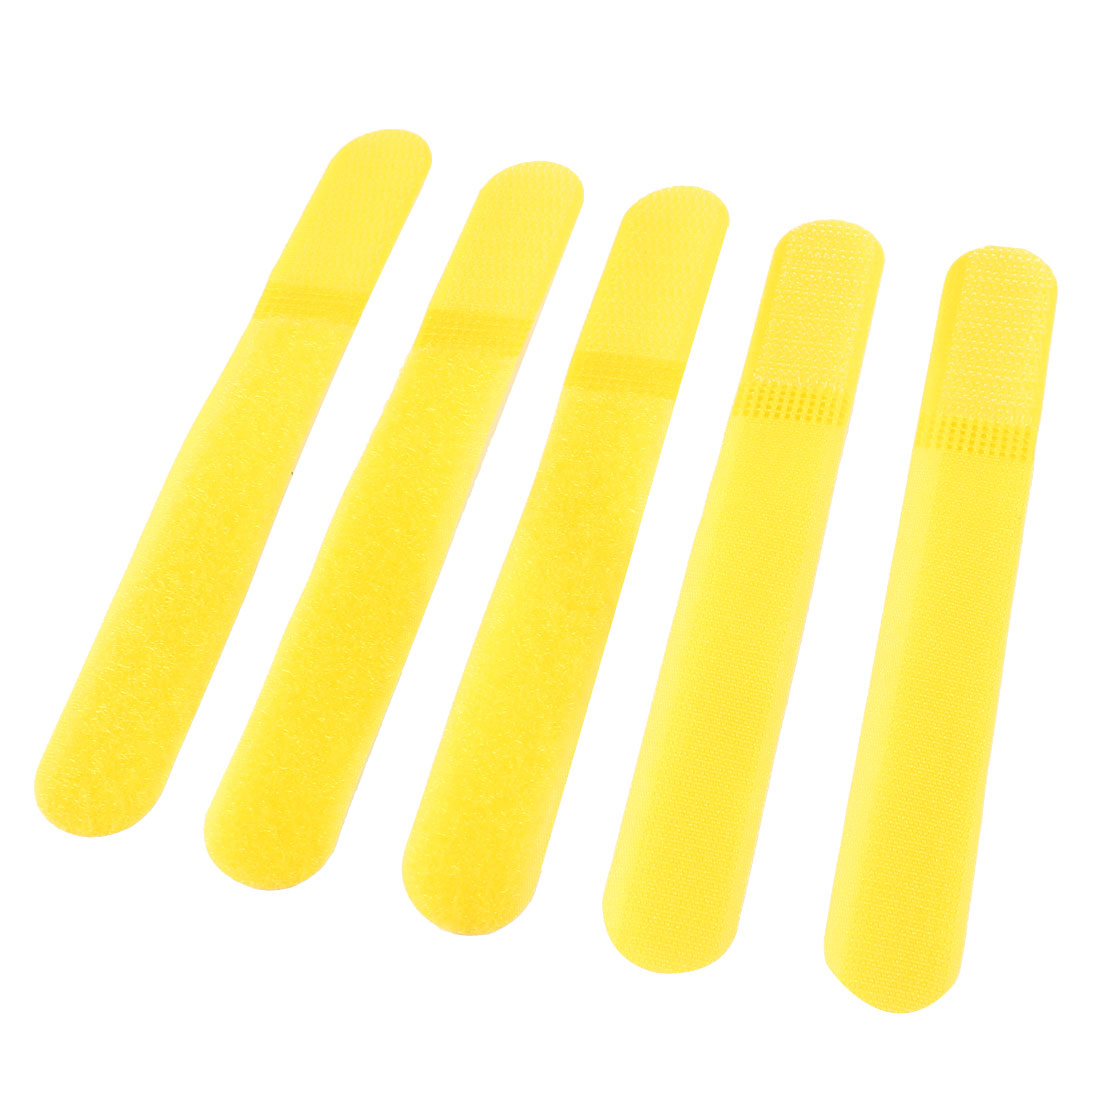 5 Pcs Detachable Fastener Hook Loop Tie Strap Cable Cord Organizer Yellow